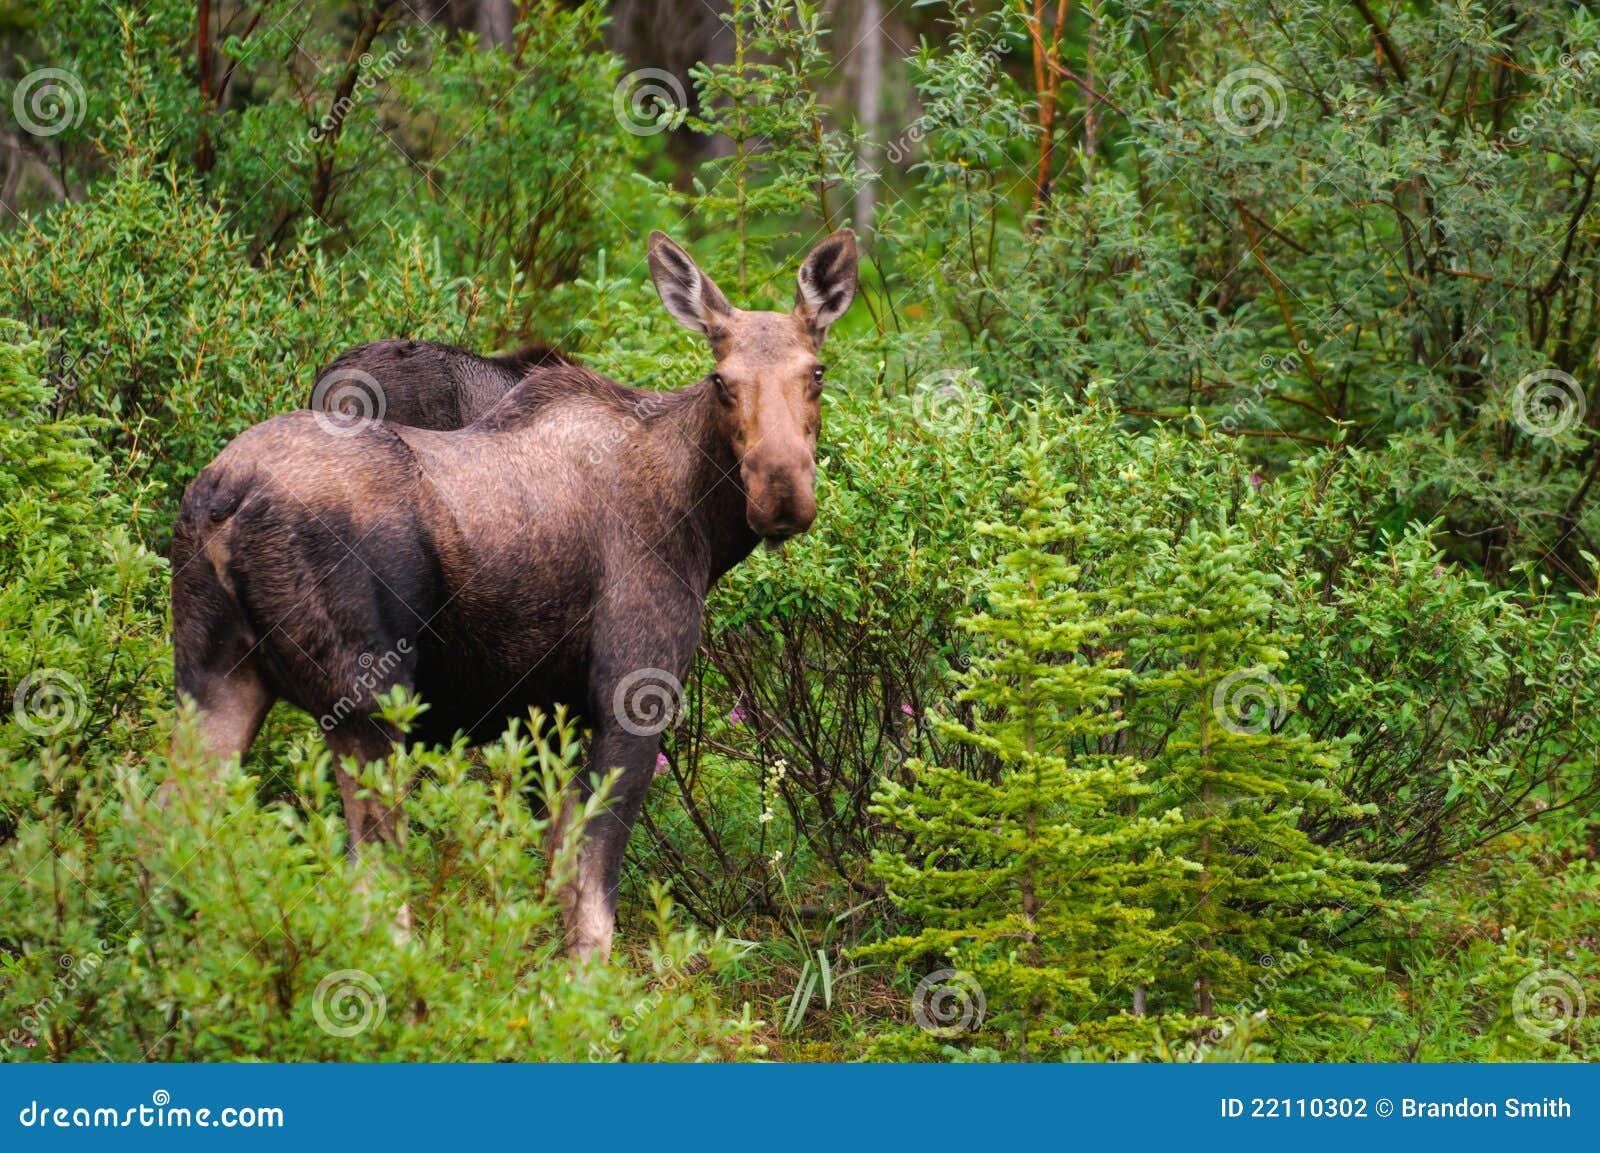 Wild Moose in the mountains, Kananaskis country Alberta Canada.